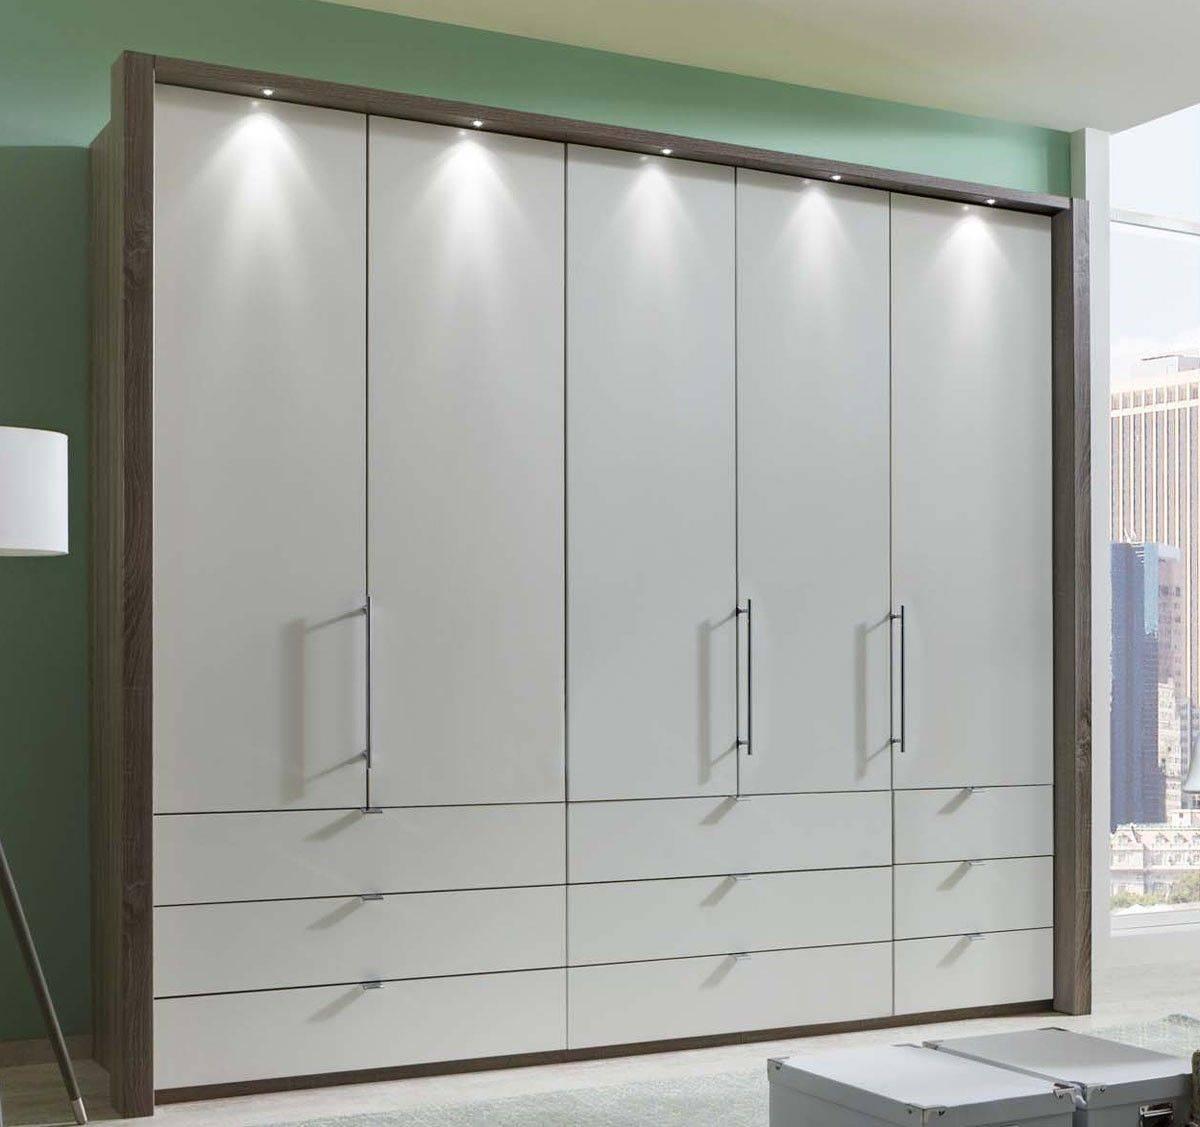 Wiemann Loft 5 Door Wardrobe With 9 Drawers With Bi Fold Panorama Within 5 Door Wardrobes (View 12 of 15)